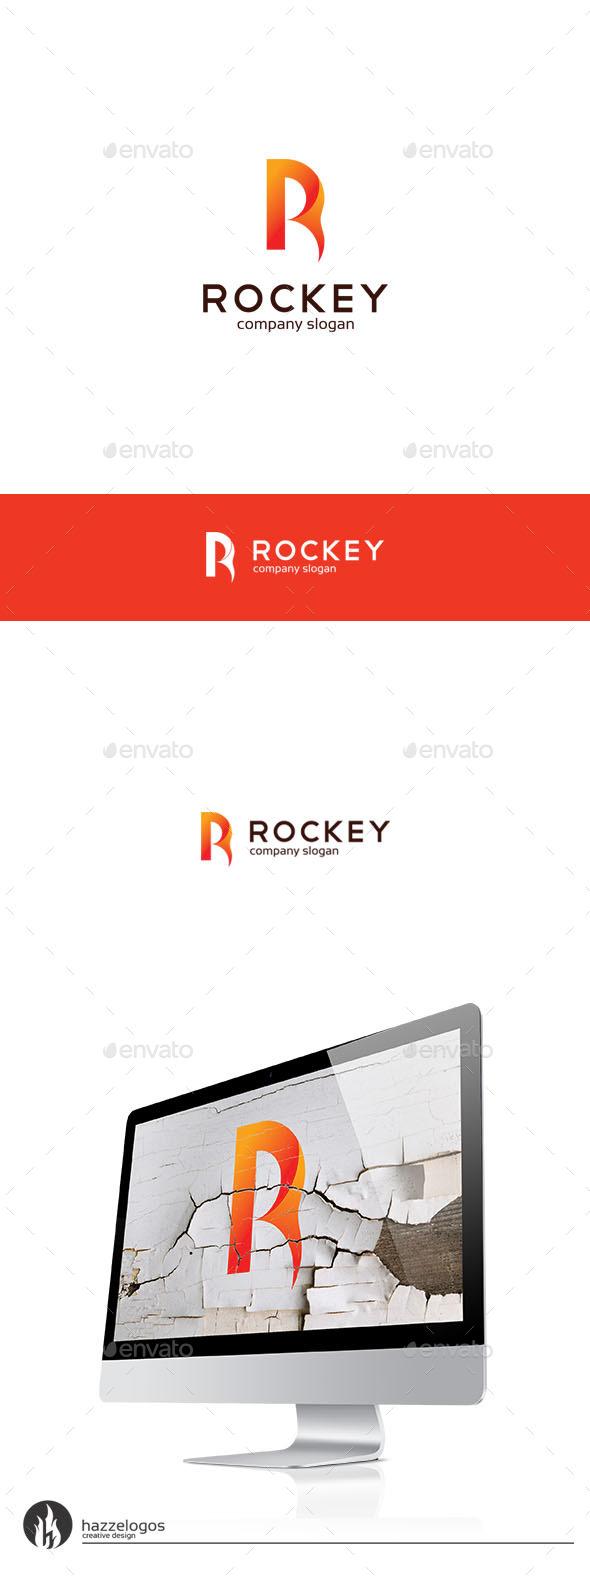 GraphicRiver Rockey Logo 9940373